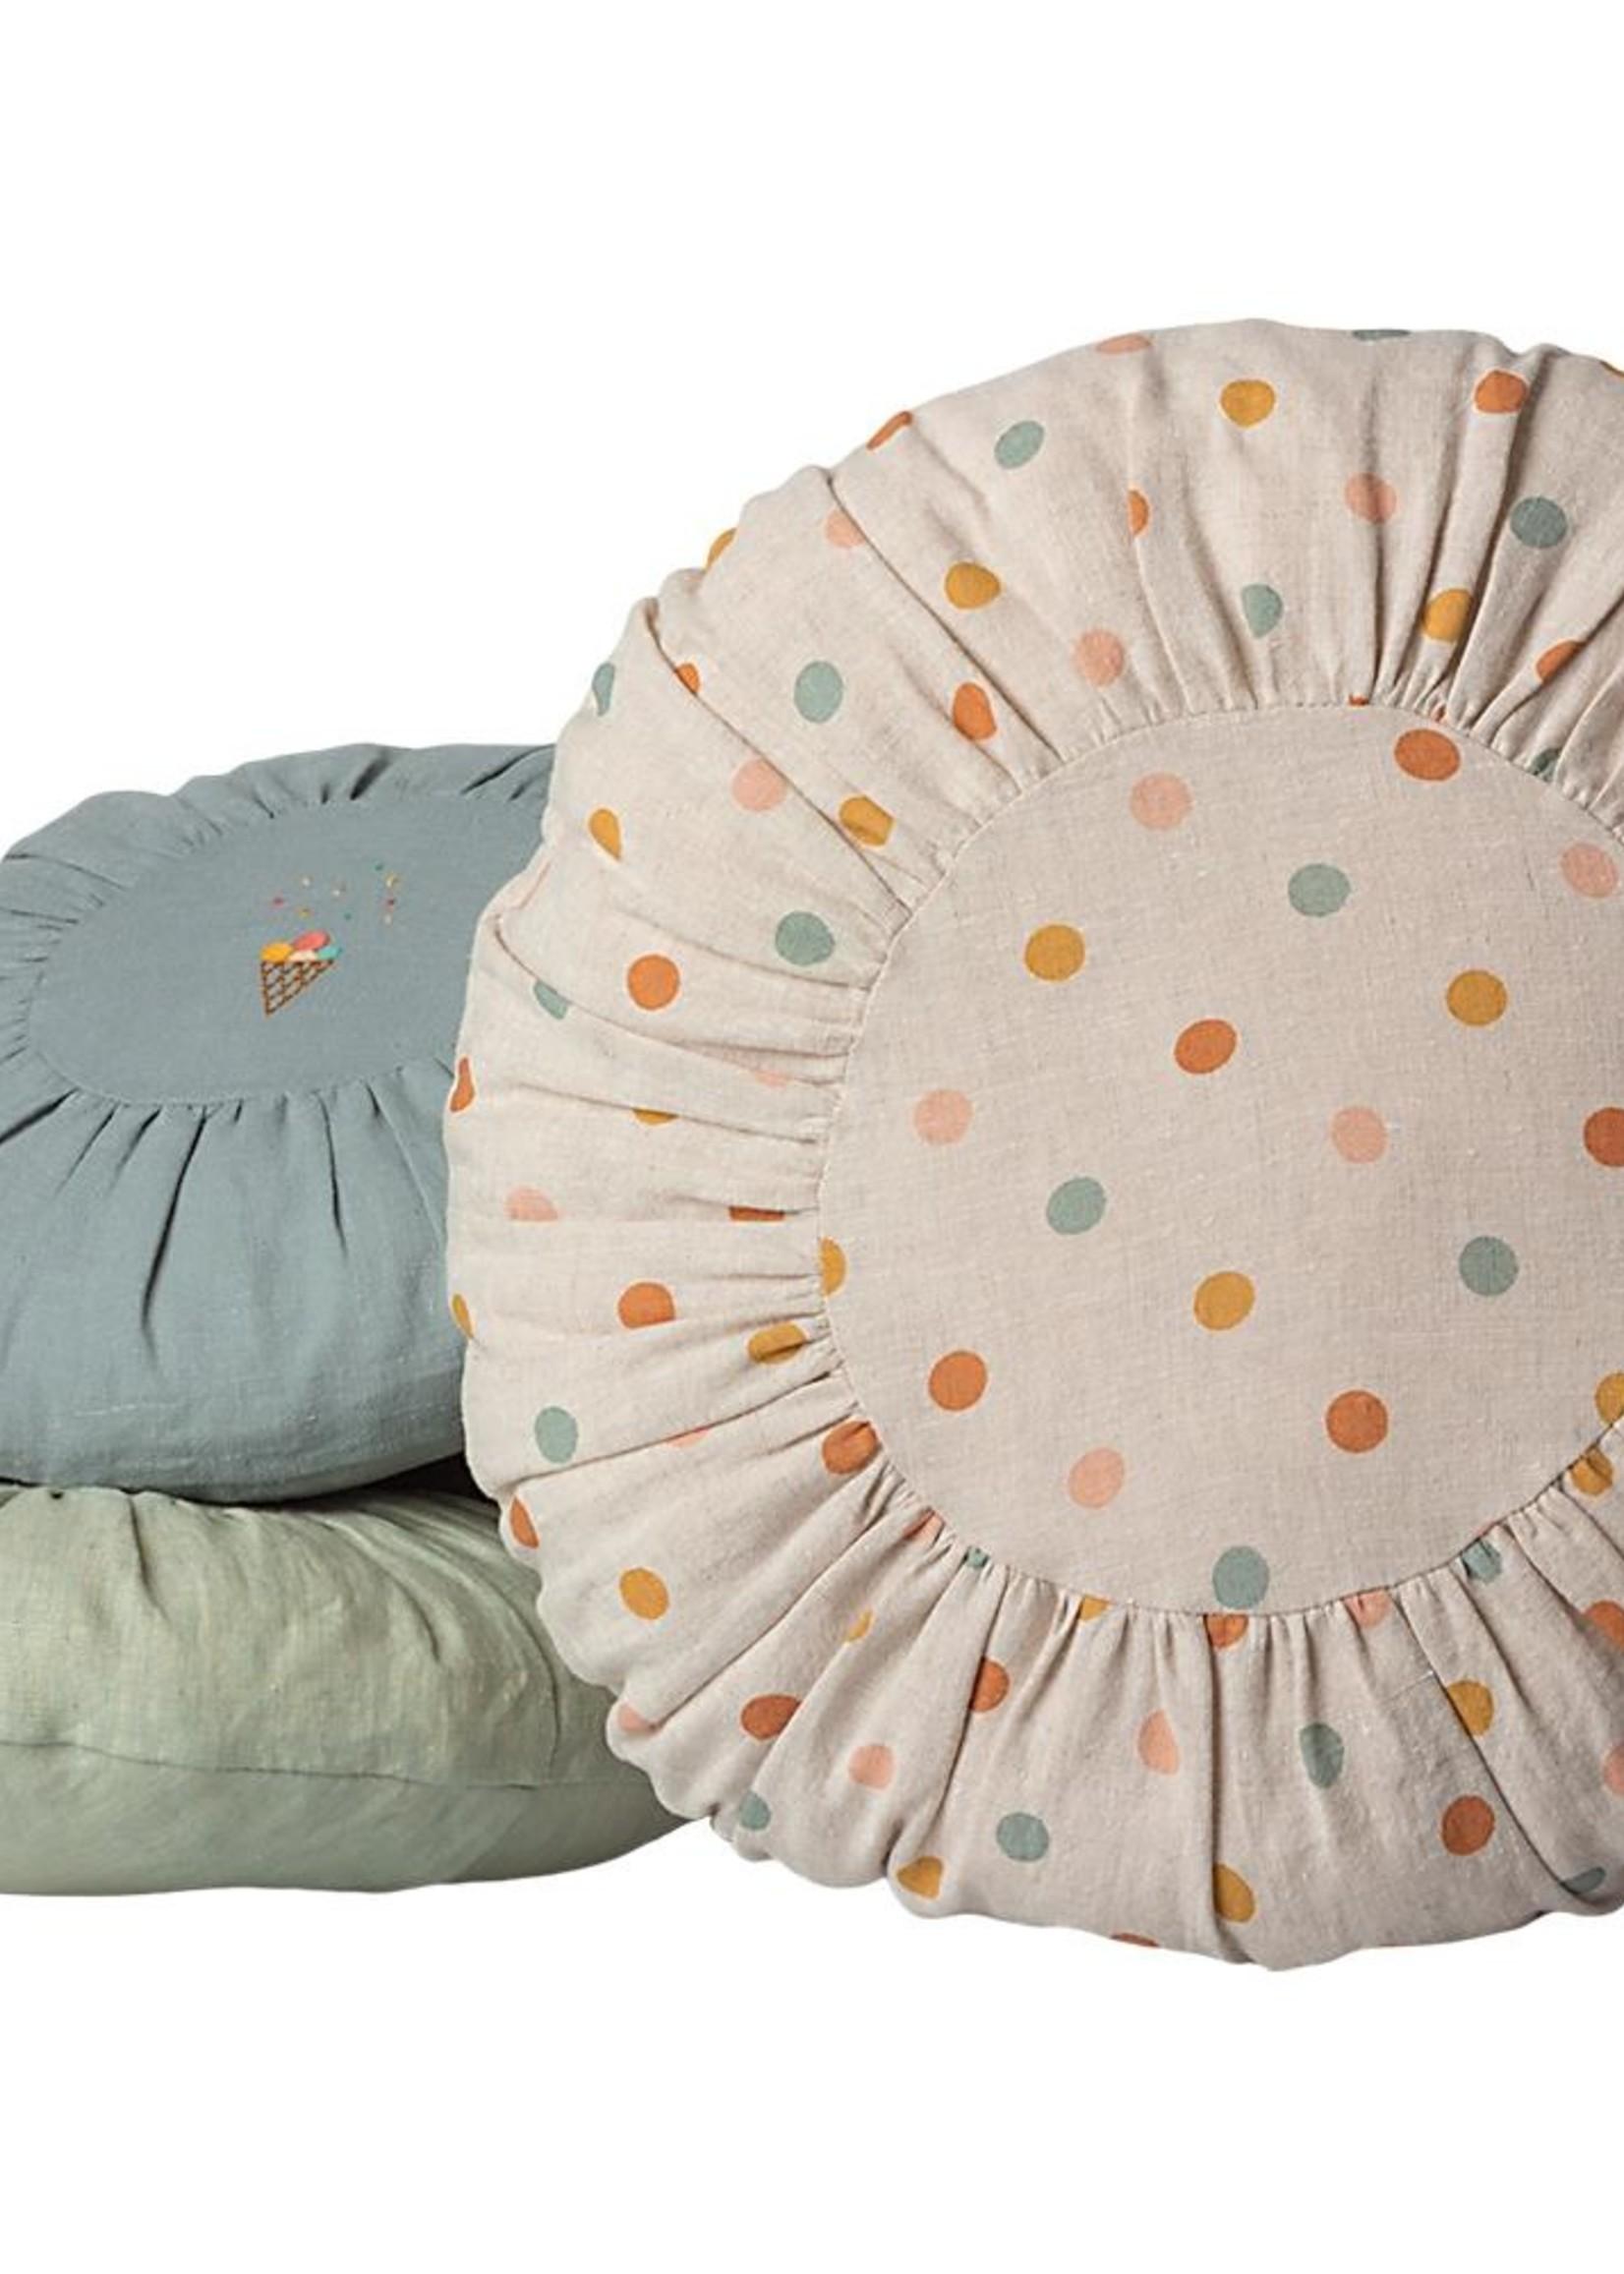 maileg Cushion Round large- Multi dots